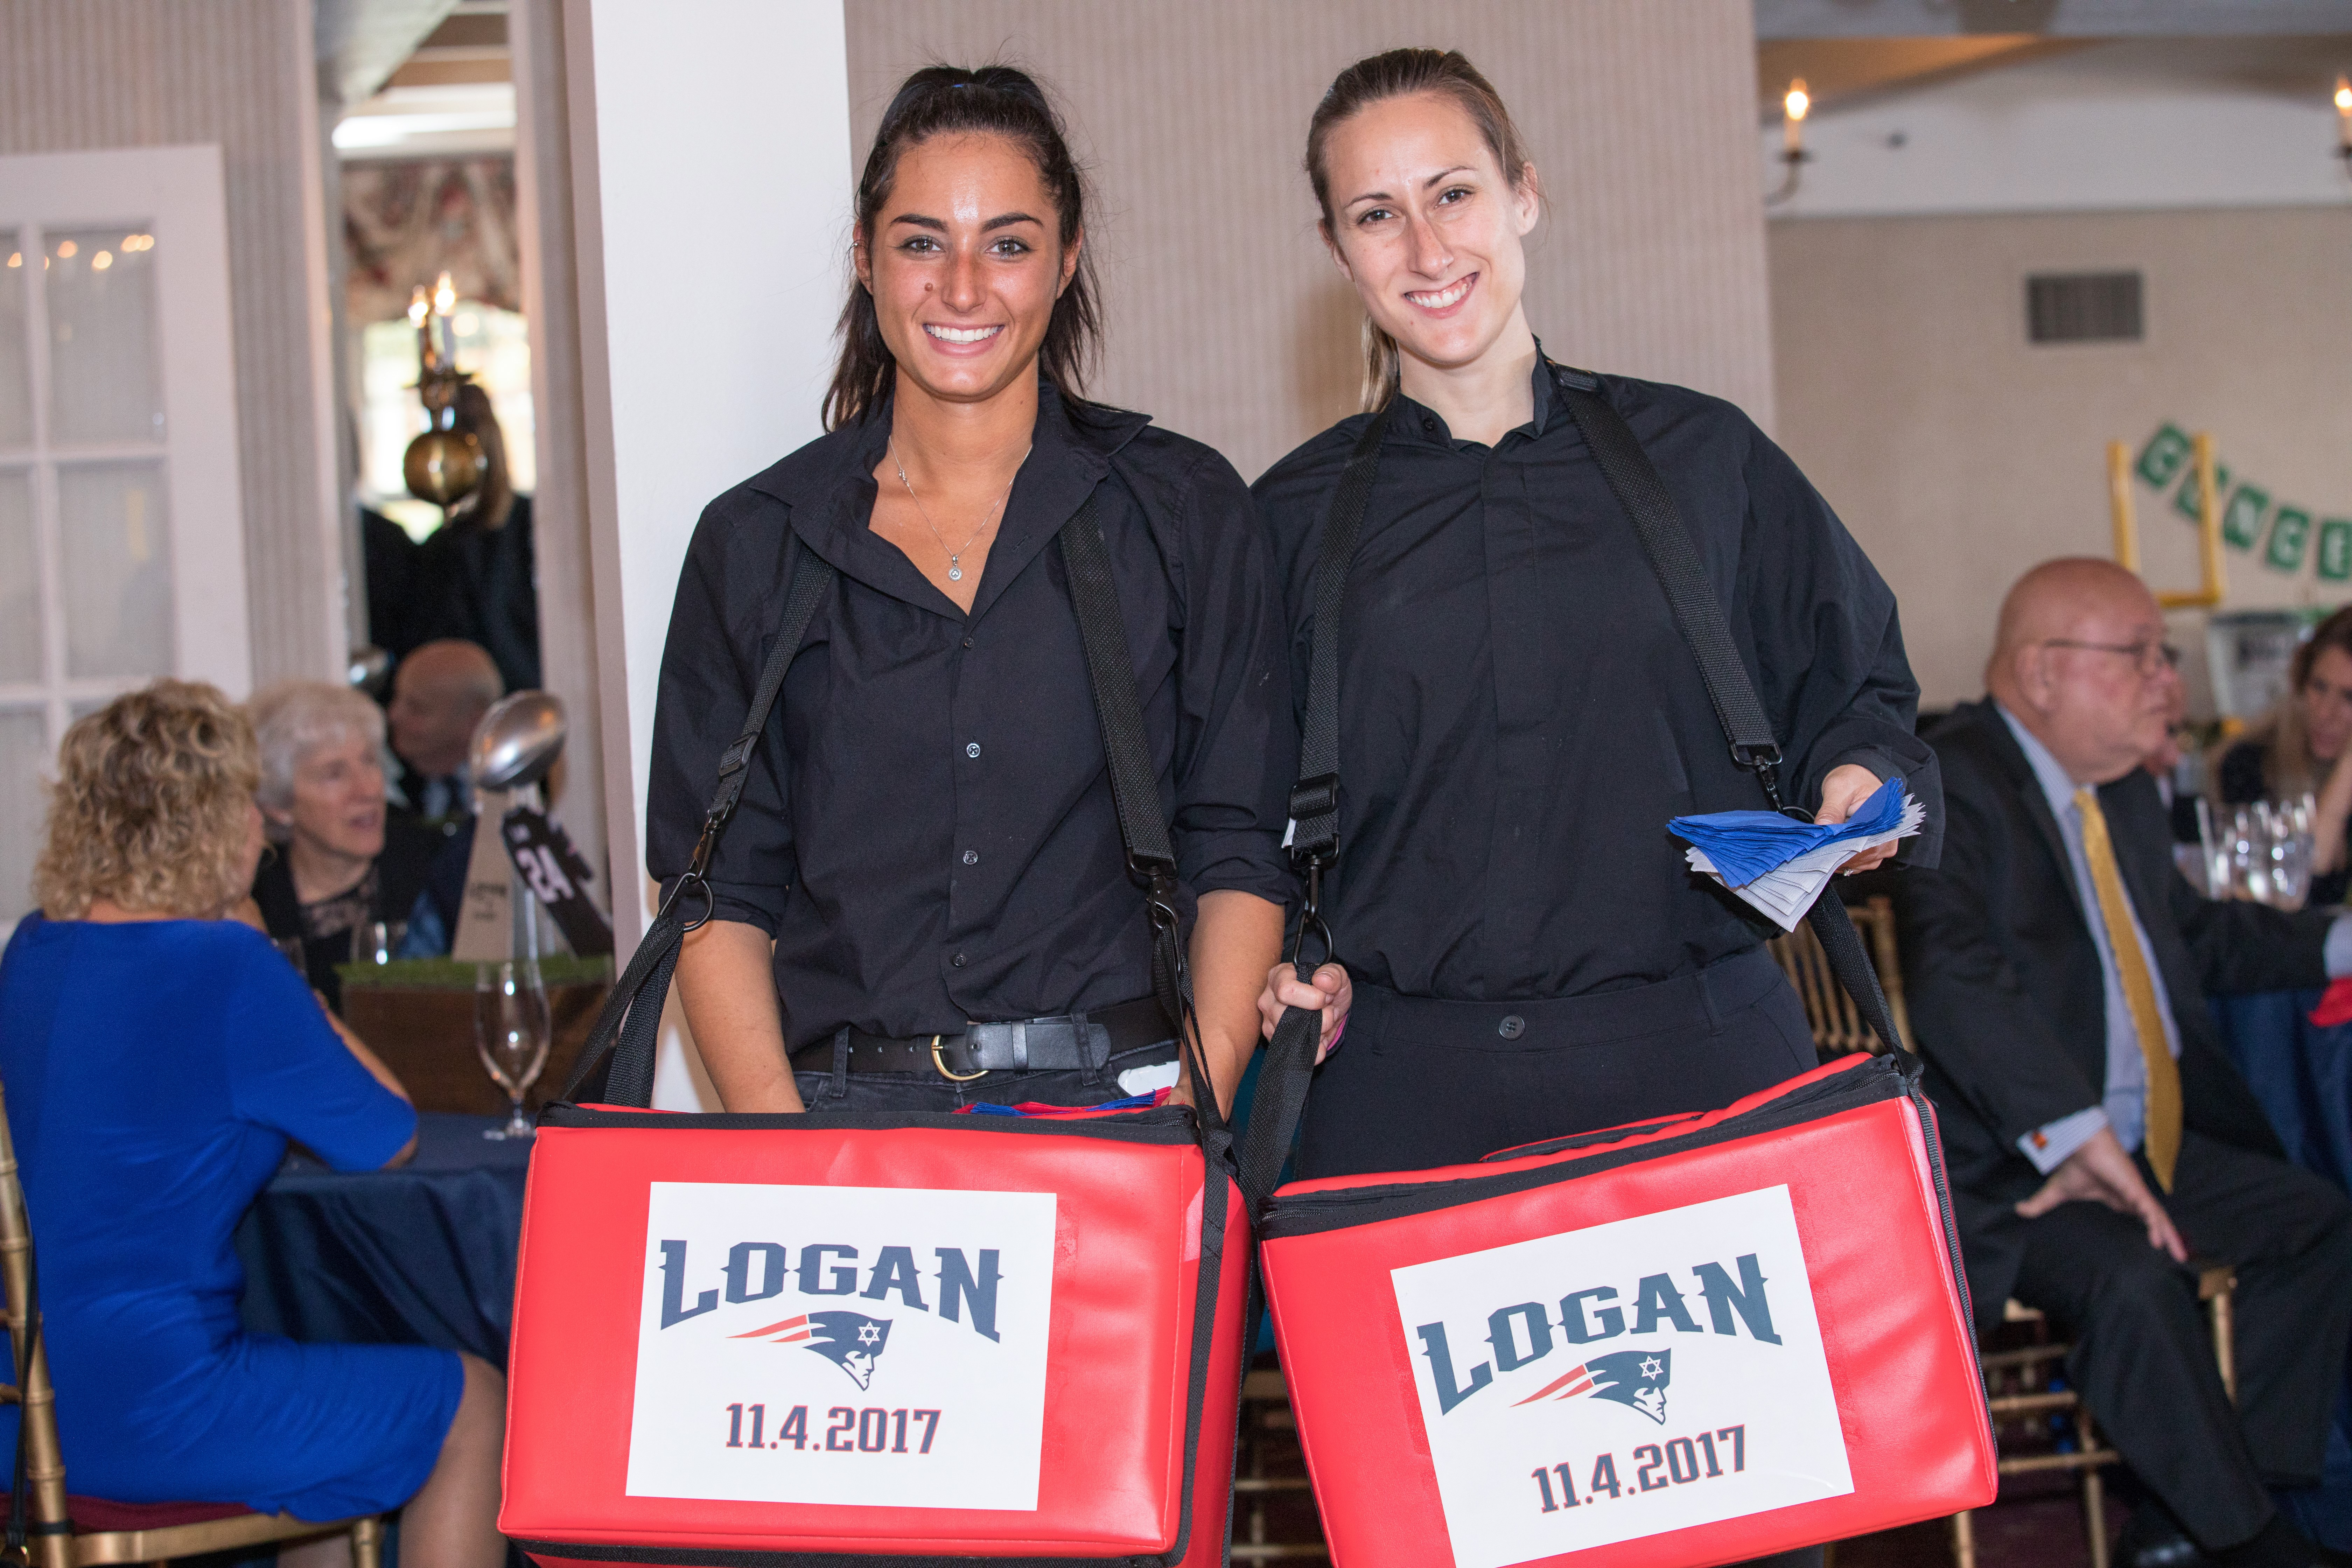 Logan Shapiro Bar Mitzvah - Staff